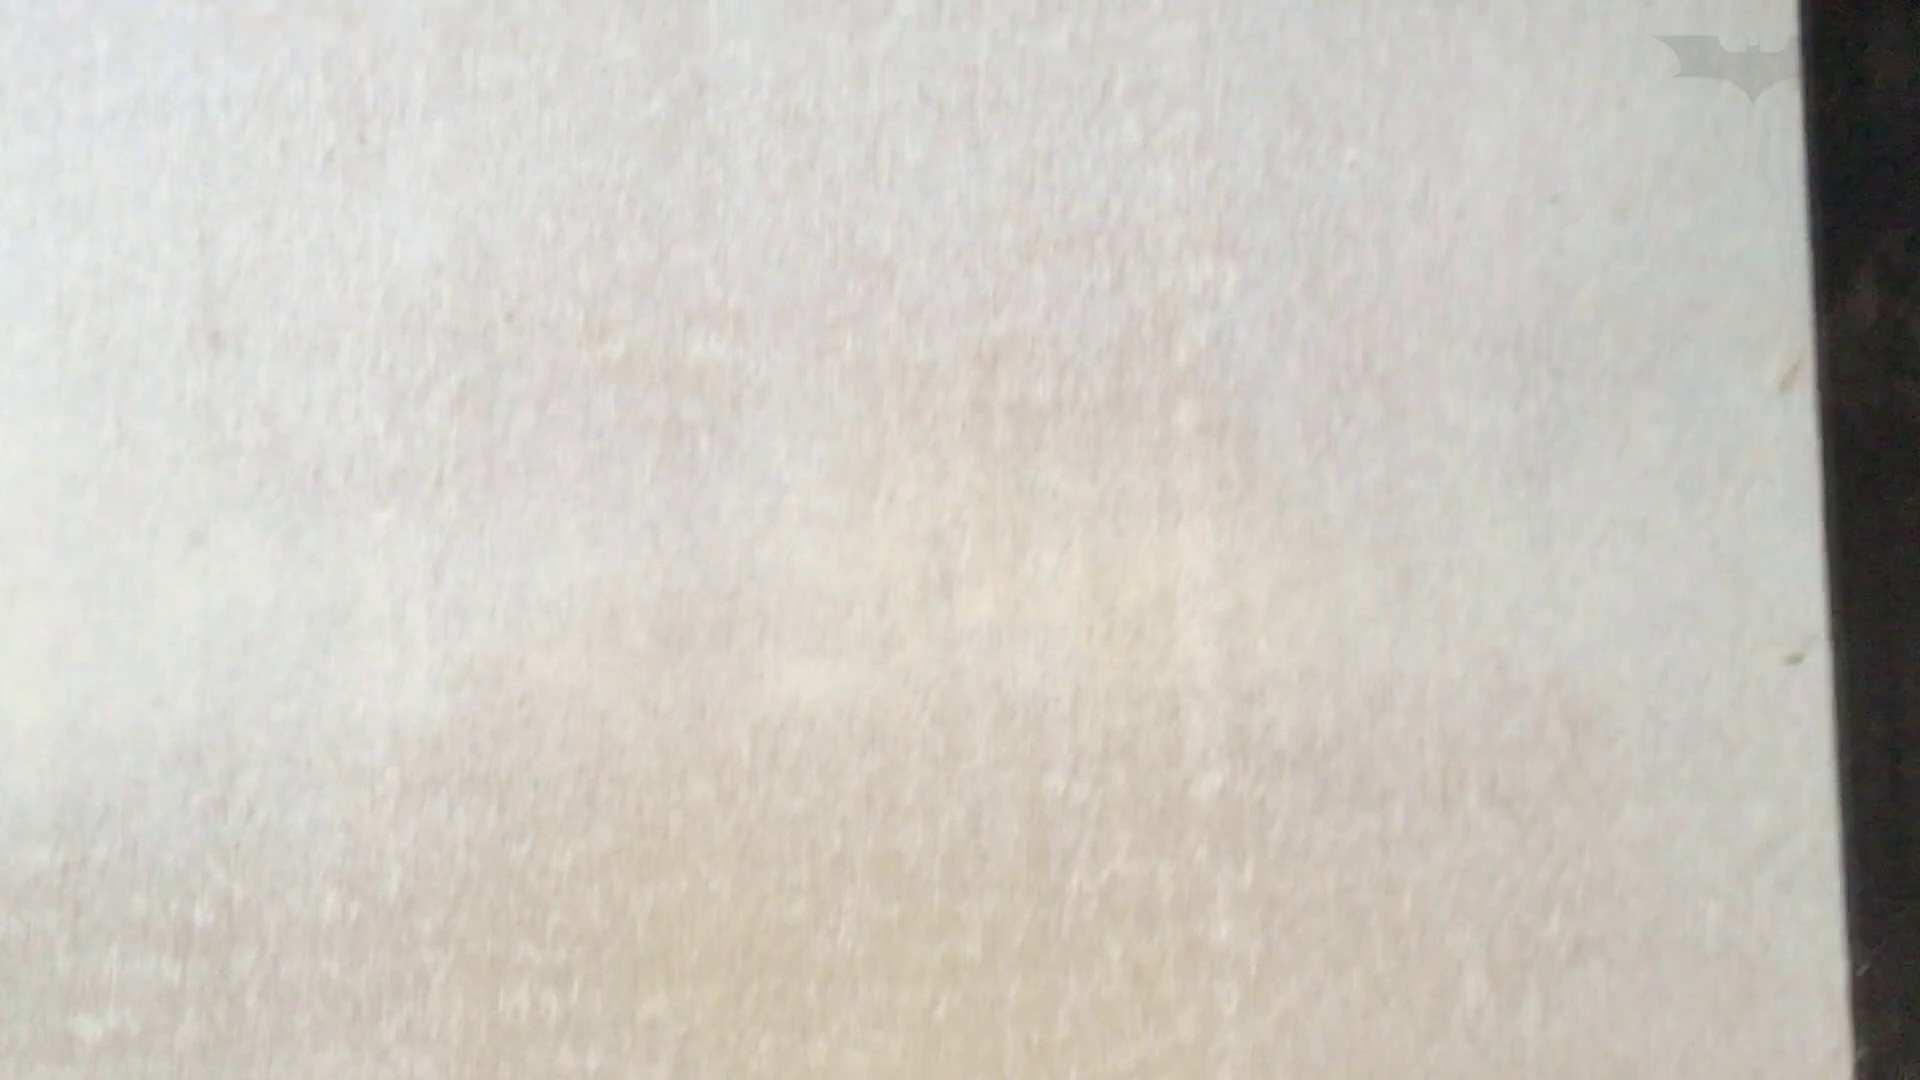 芸術大学ガチ潜入盗撮 JD盗撮 美女の洗面所の秘密 Vol.89 洗面所着替え | 潜入エロ調査  77連発 52